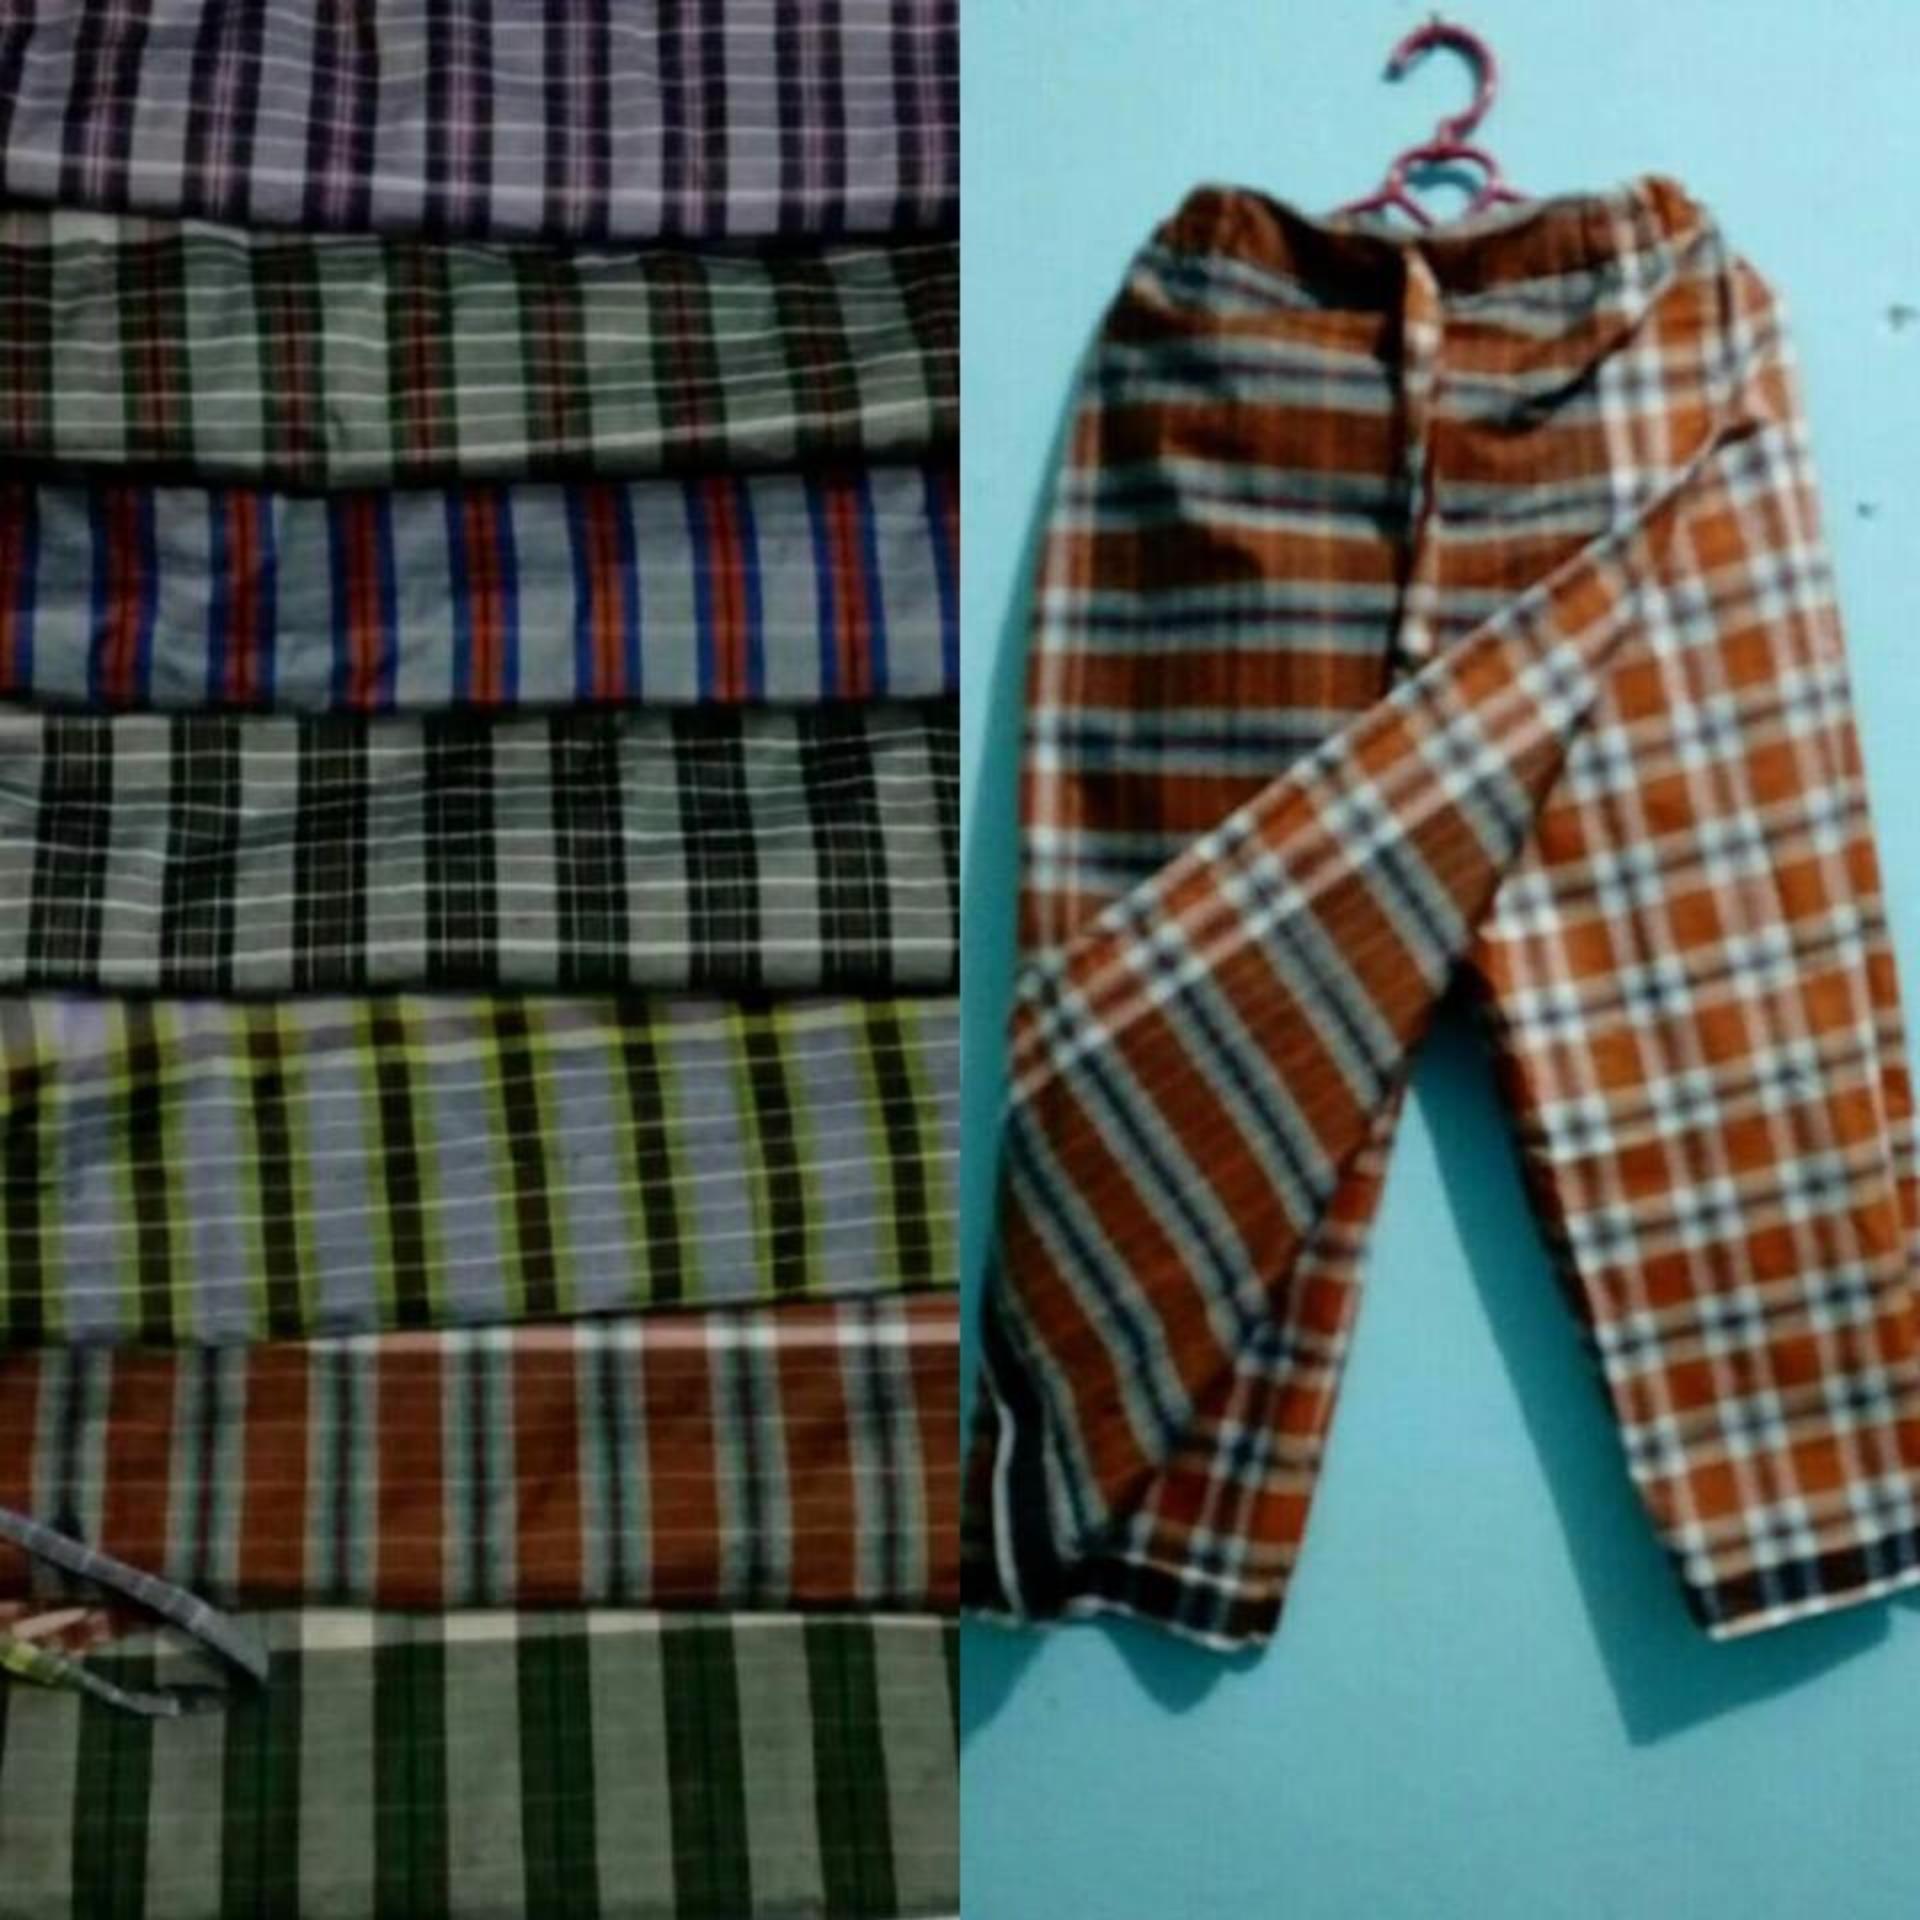 3 Pcs Hilya Celana Sarung Cesar Muslim Anak 3 5 Tahun Di Jawa Barat